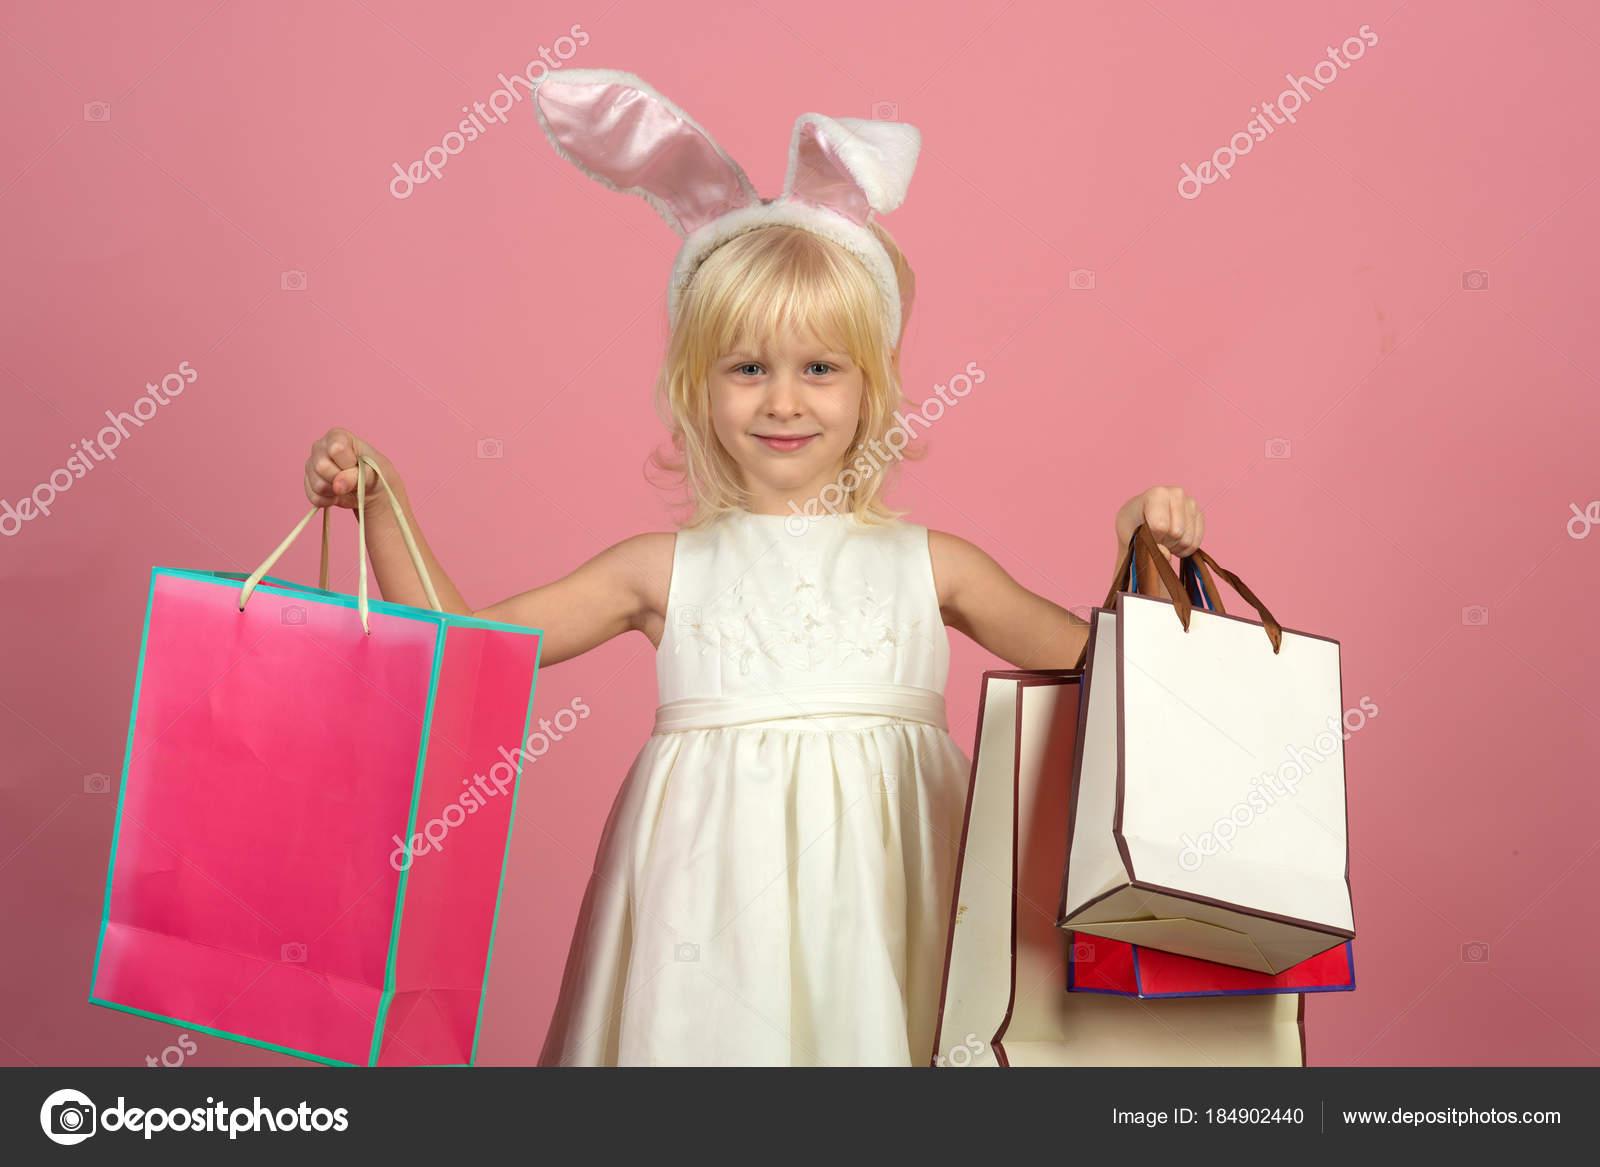 44285fce3c5 Χαμόγελο του παιδιού με με χάρτινες τσάντες — Φωτογραφία Αρχείου ...